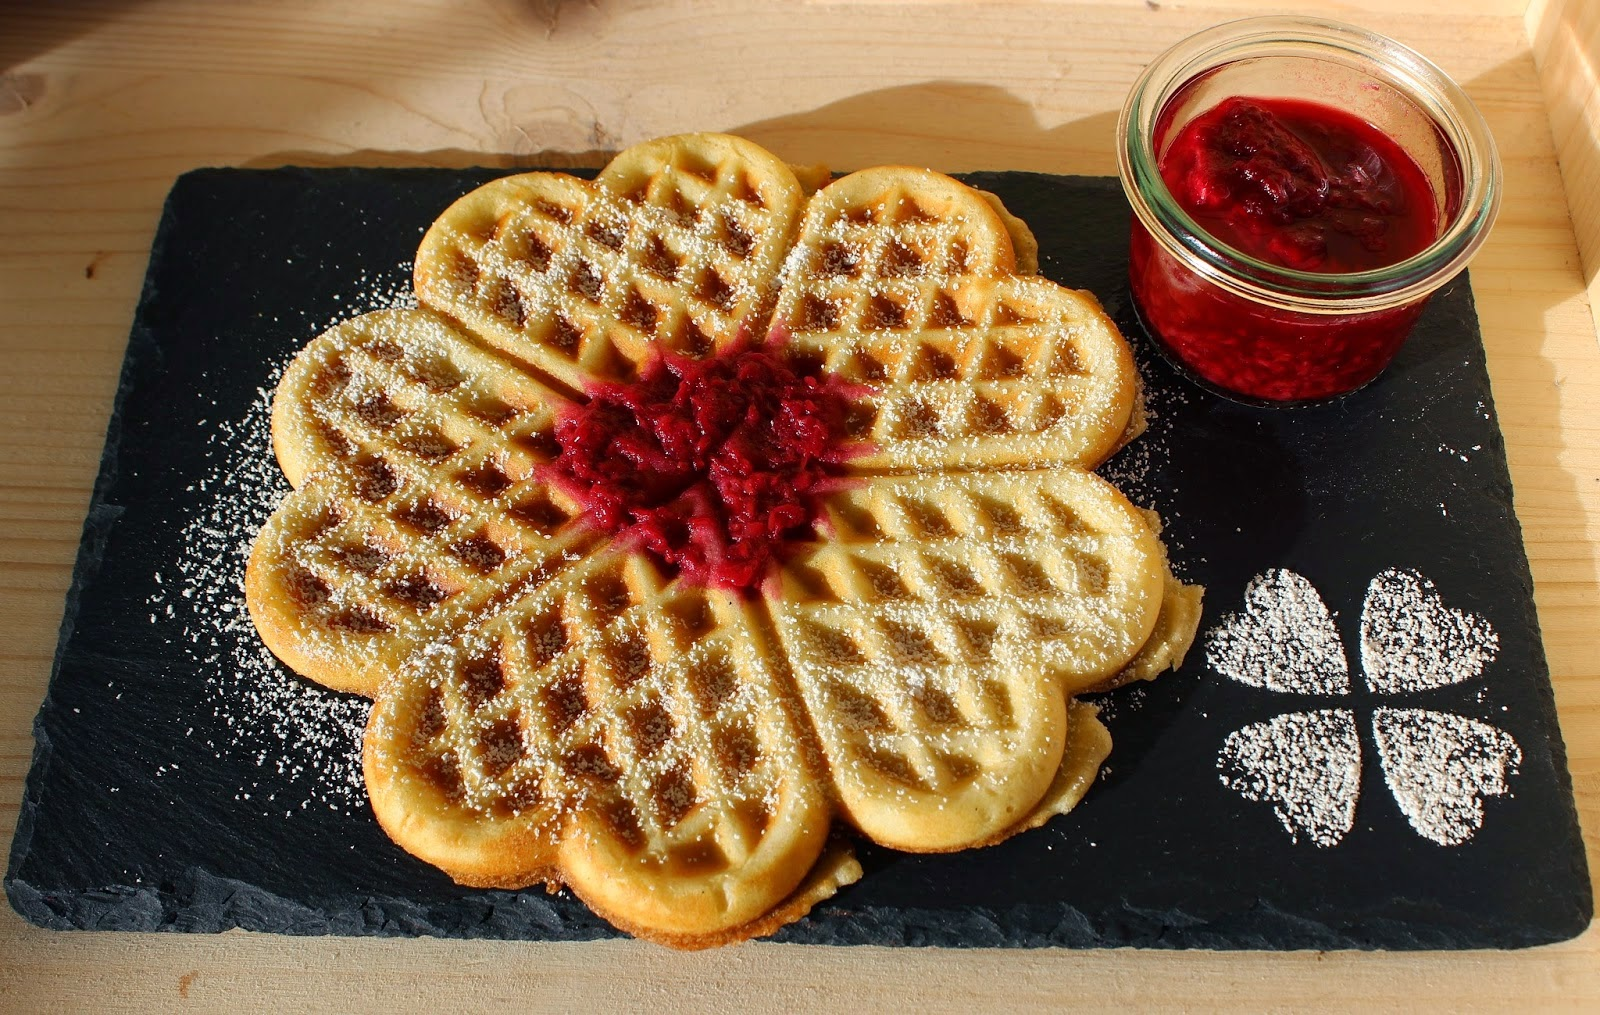 http://food-with-love-by-julia.blogspot.de/2014/11/waffeln-mit-himbeer-vanillesauce.html